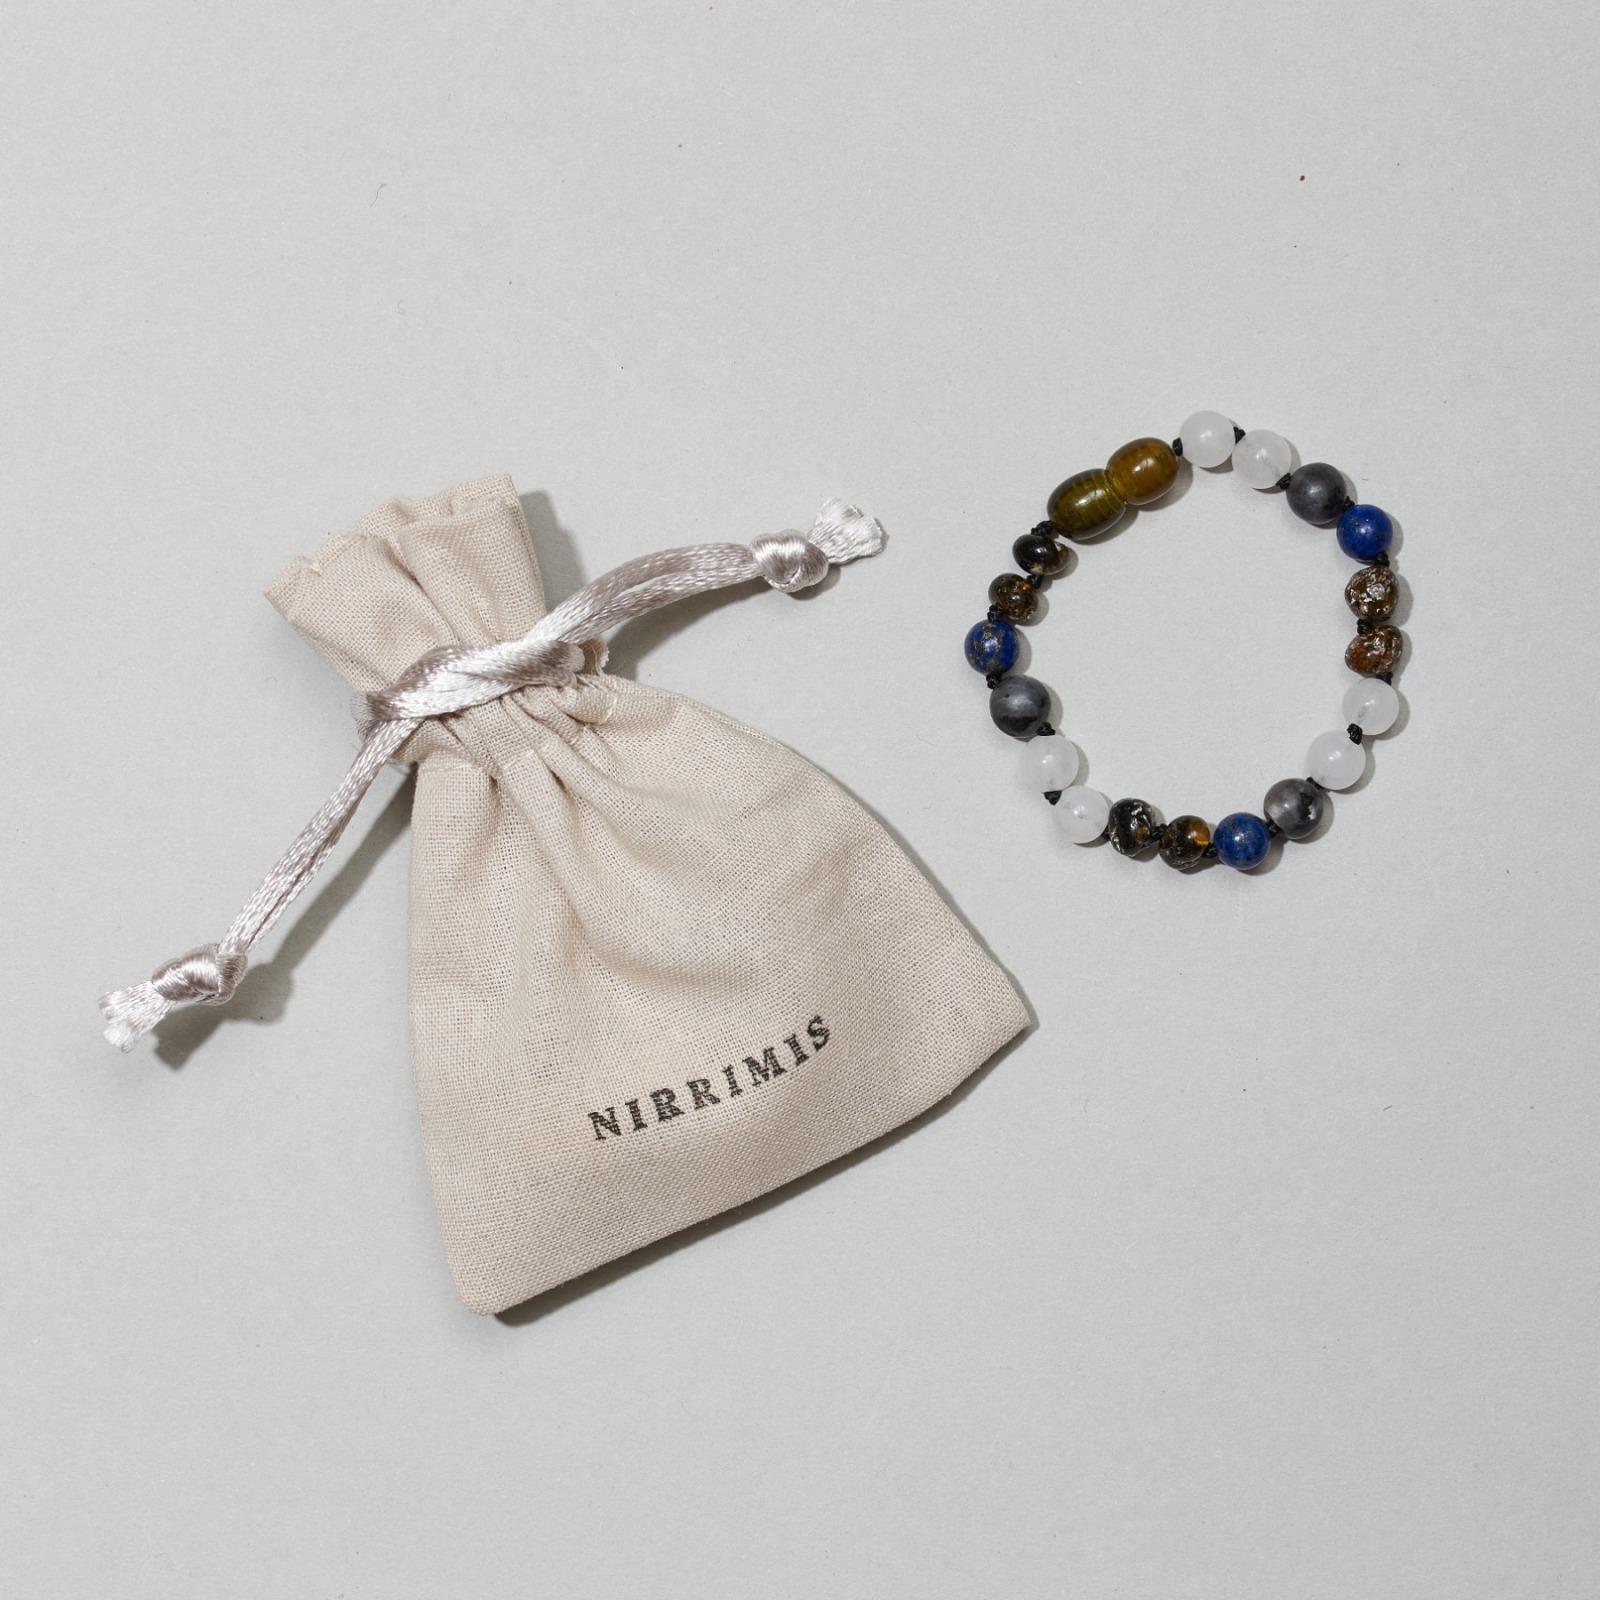 Nirrimis Armband Lazuli